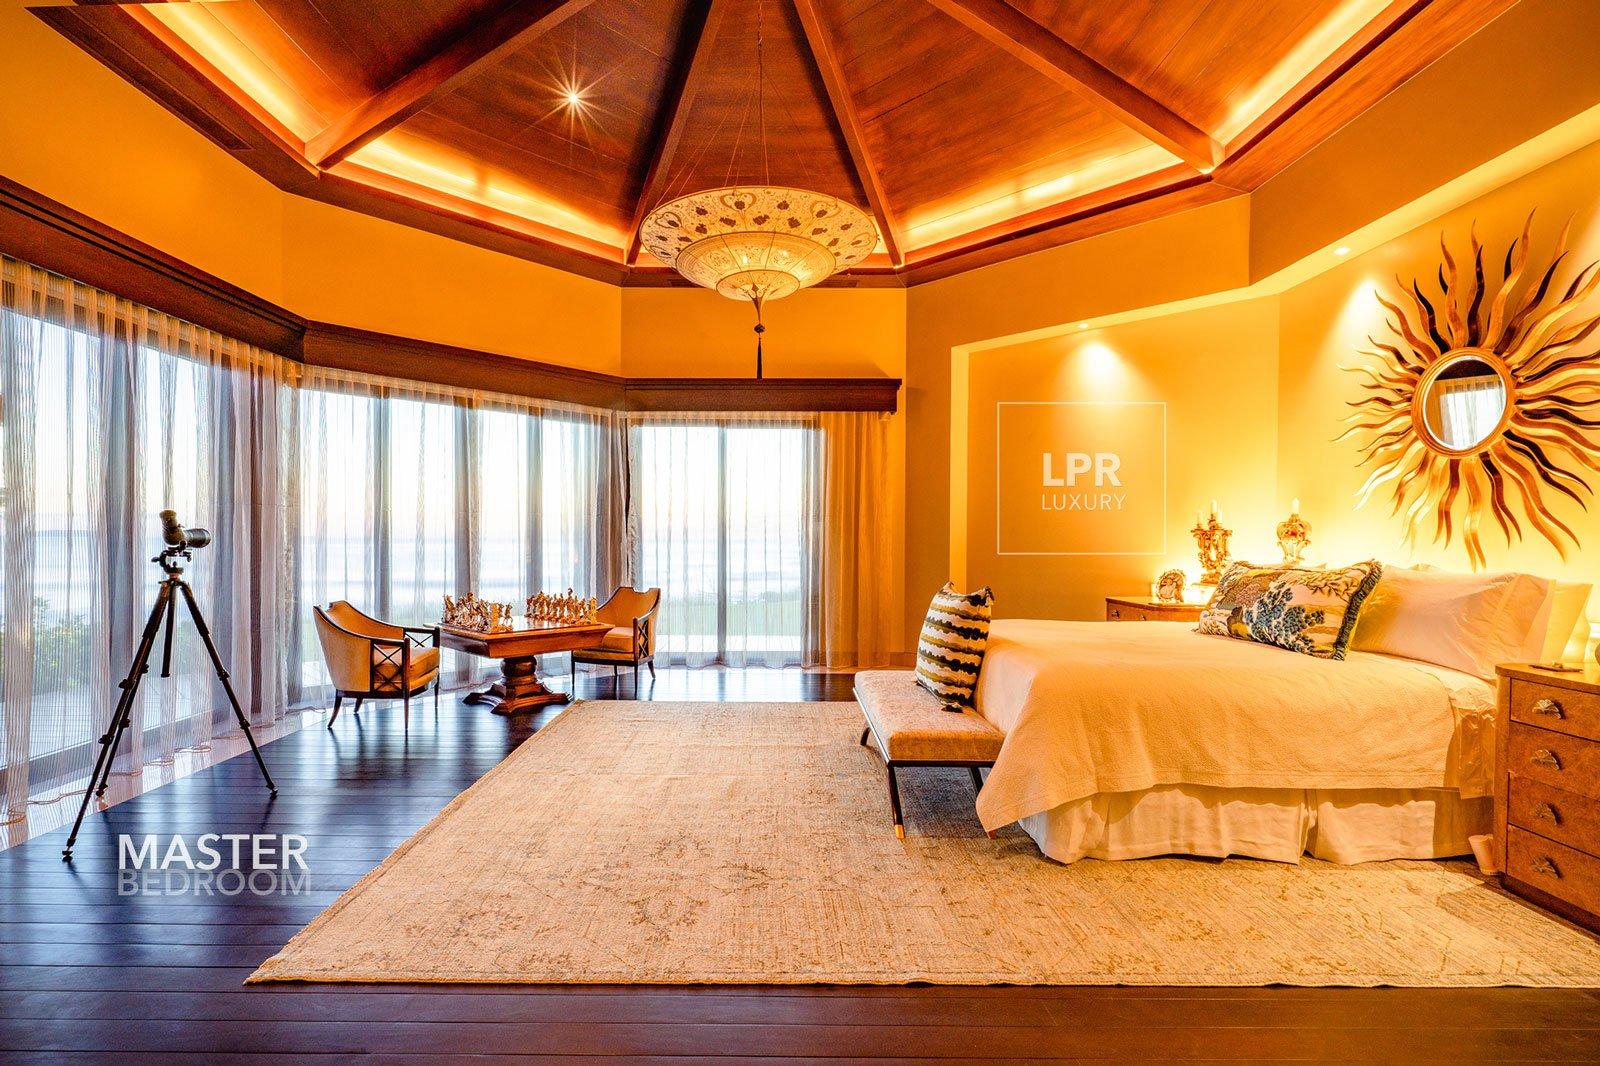 Villa La Punta Estates X - Ultra luxury Punta Mita beachfront vacation villa | Experience a secret underground speakeasy playground in Mexico.